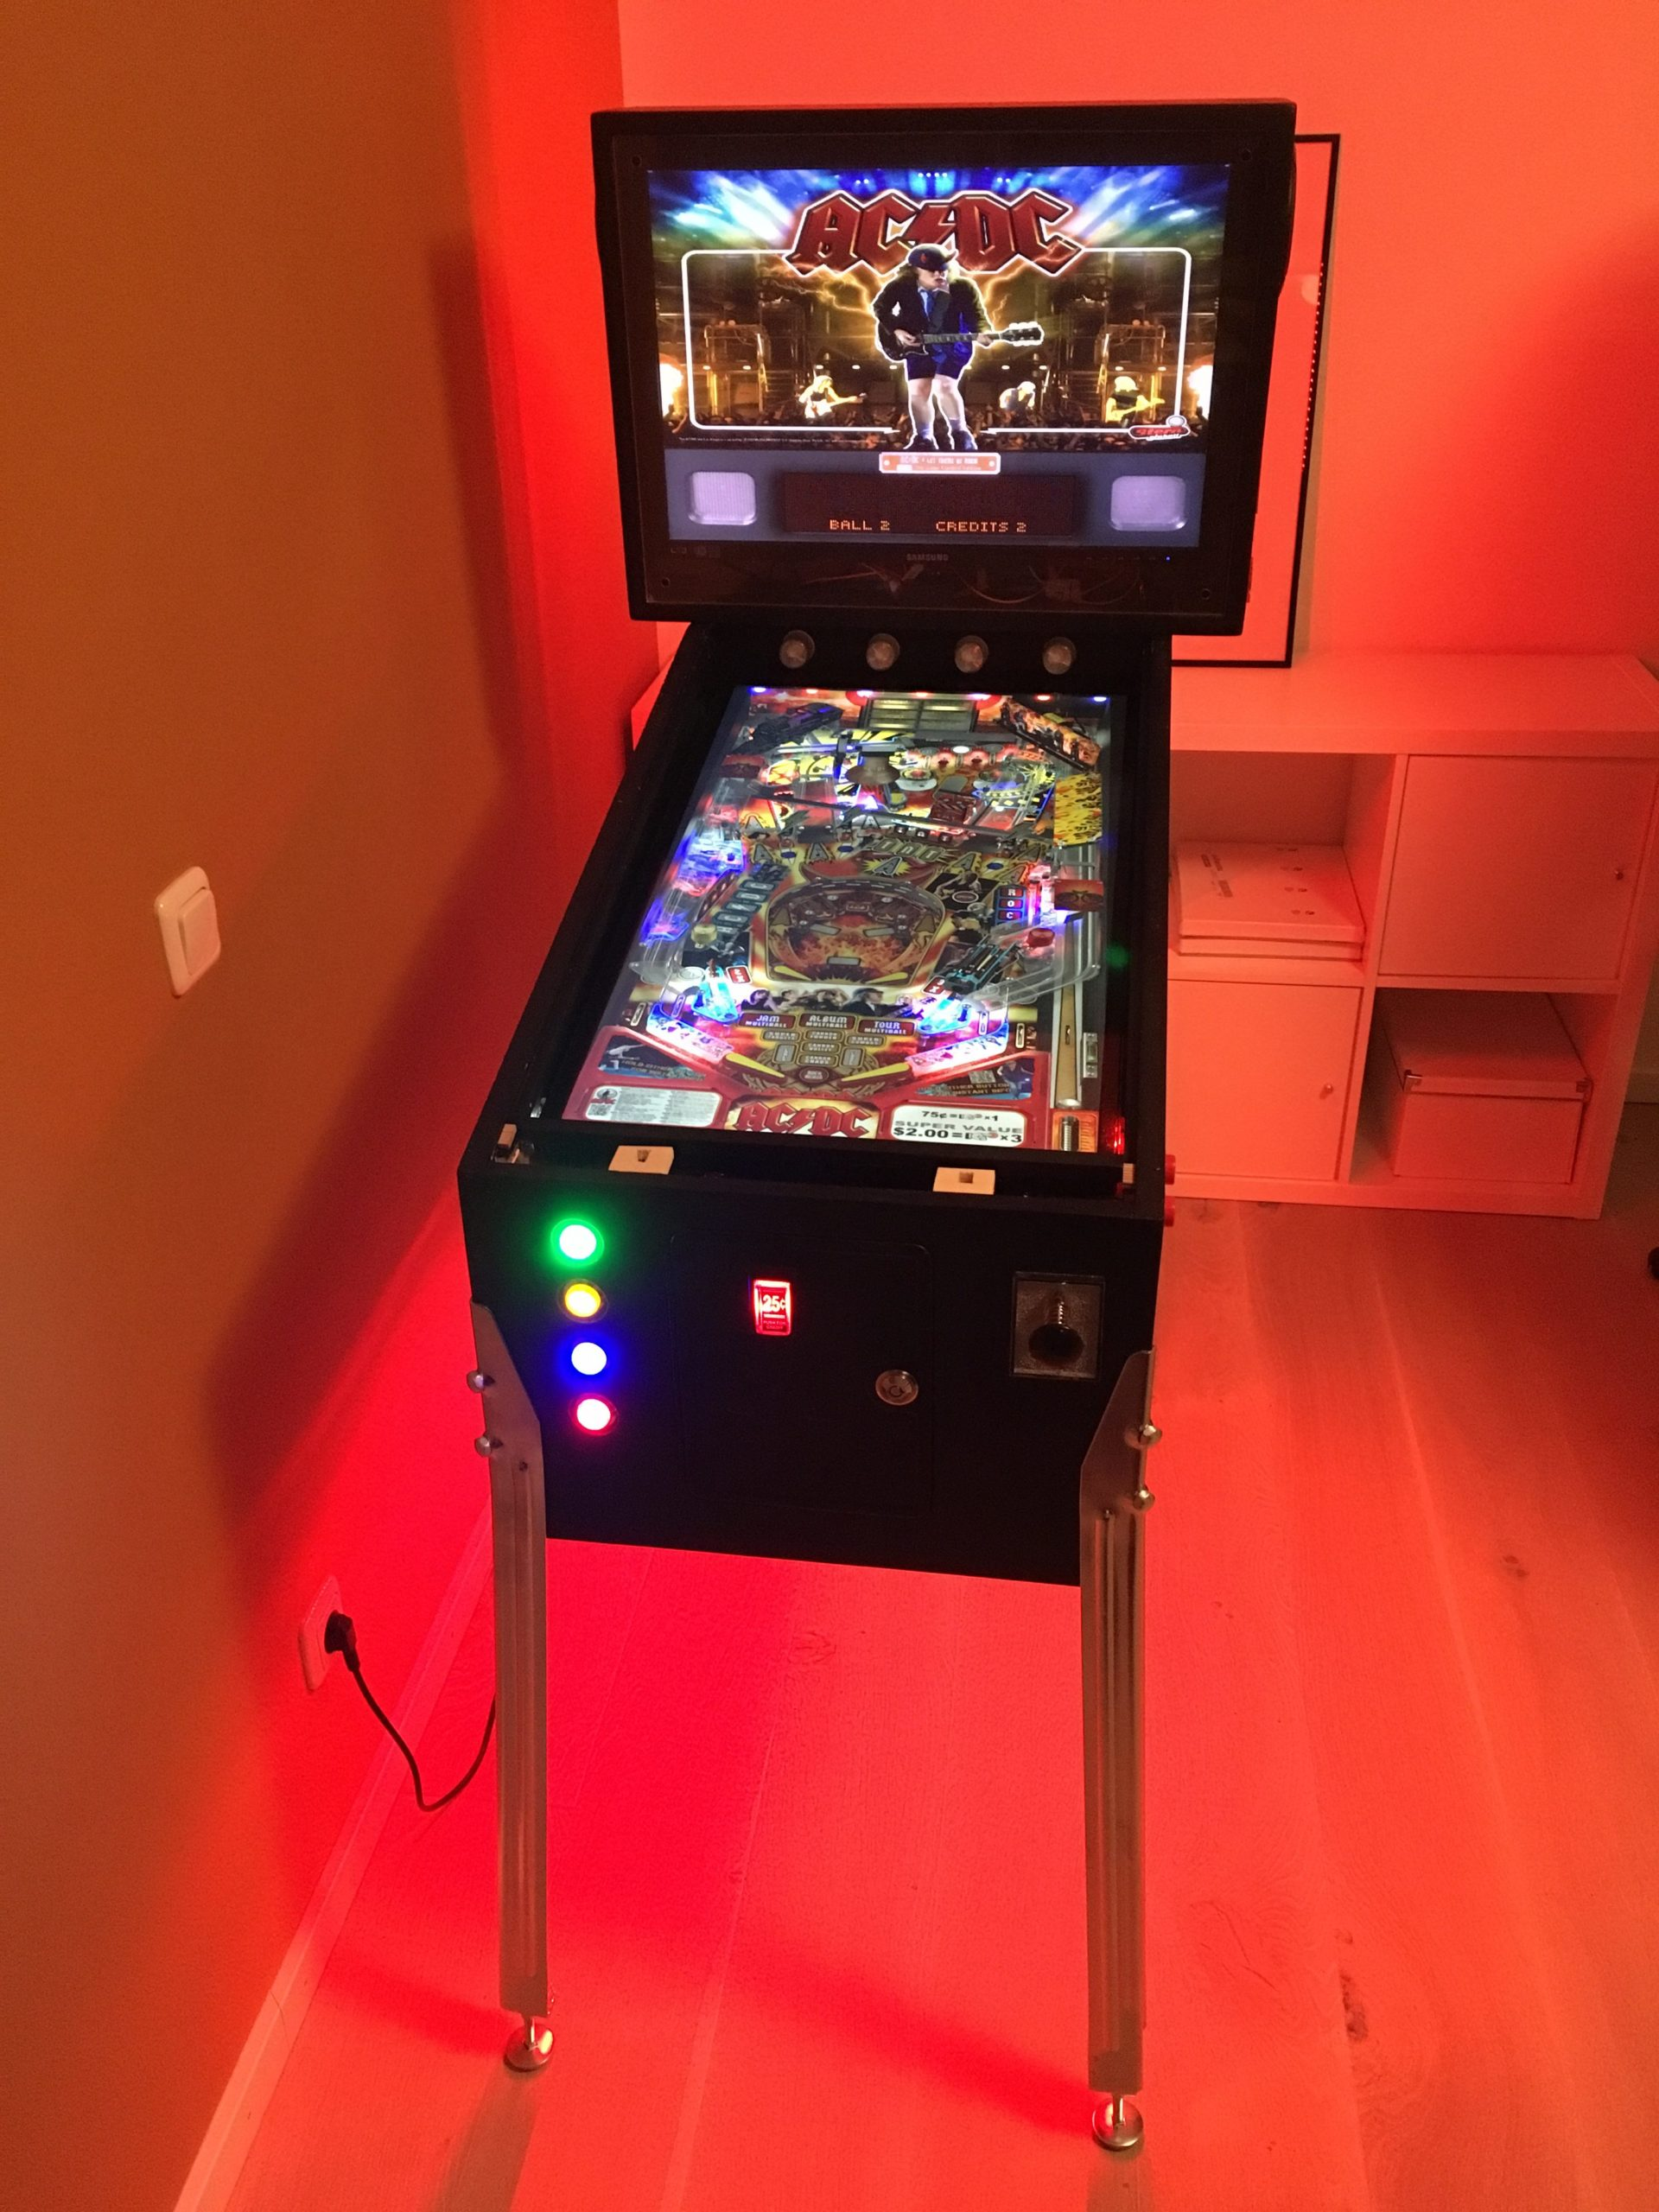 fully working and bright Dot Matrix display for pinball machine